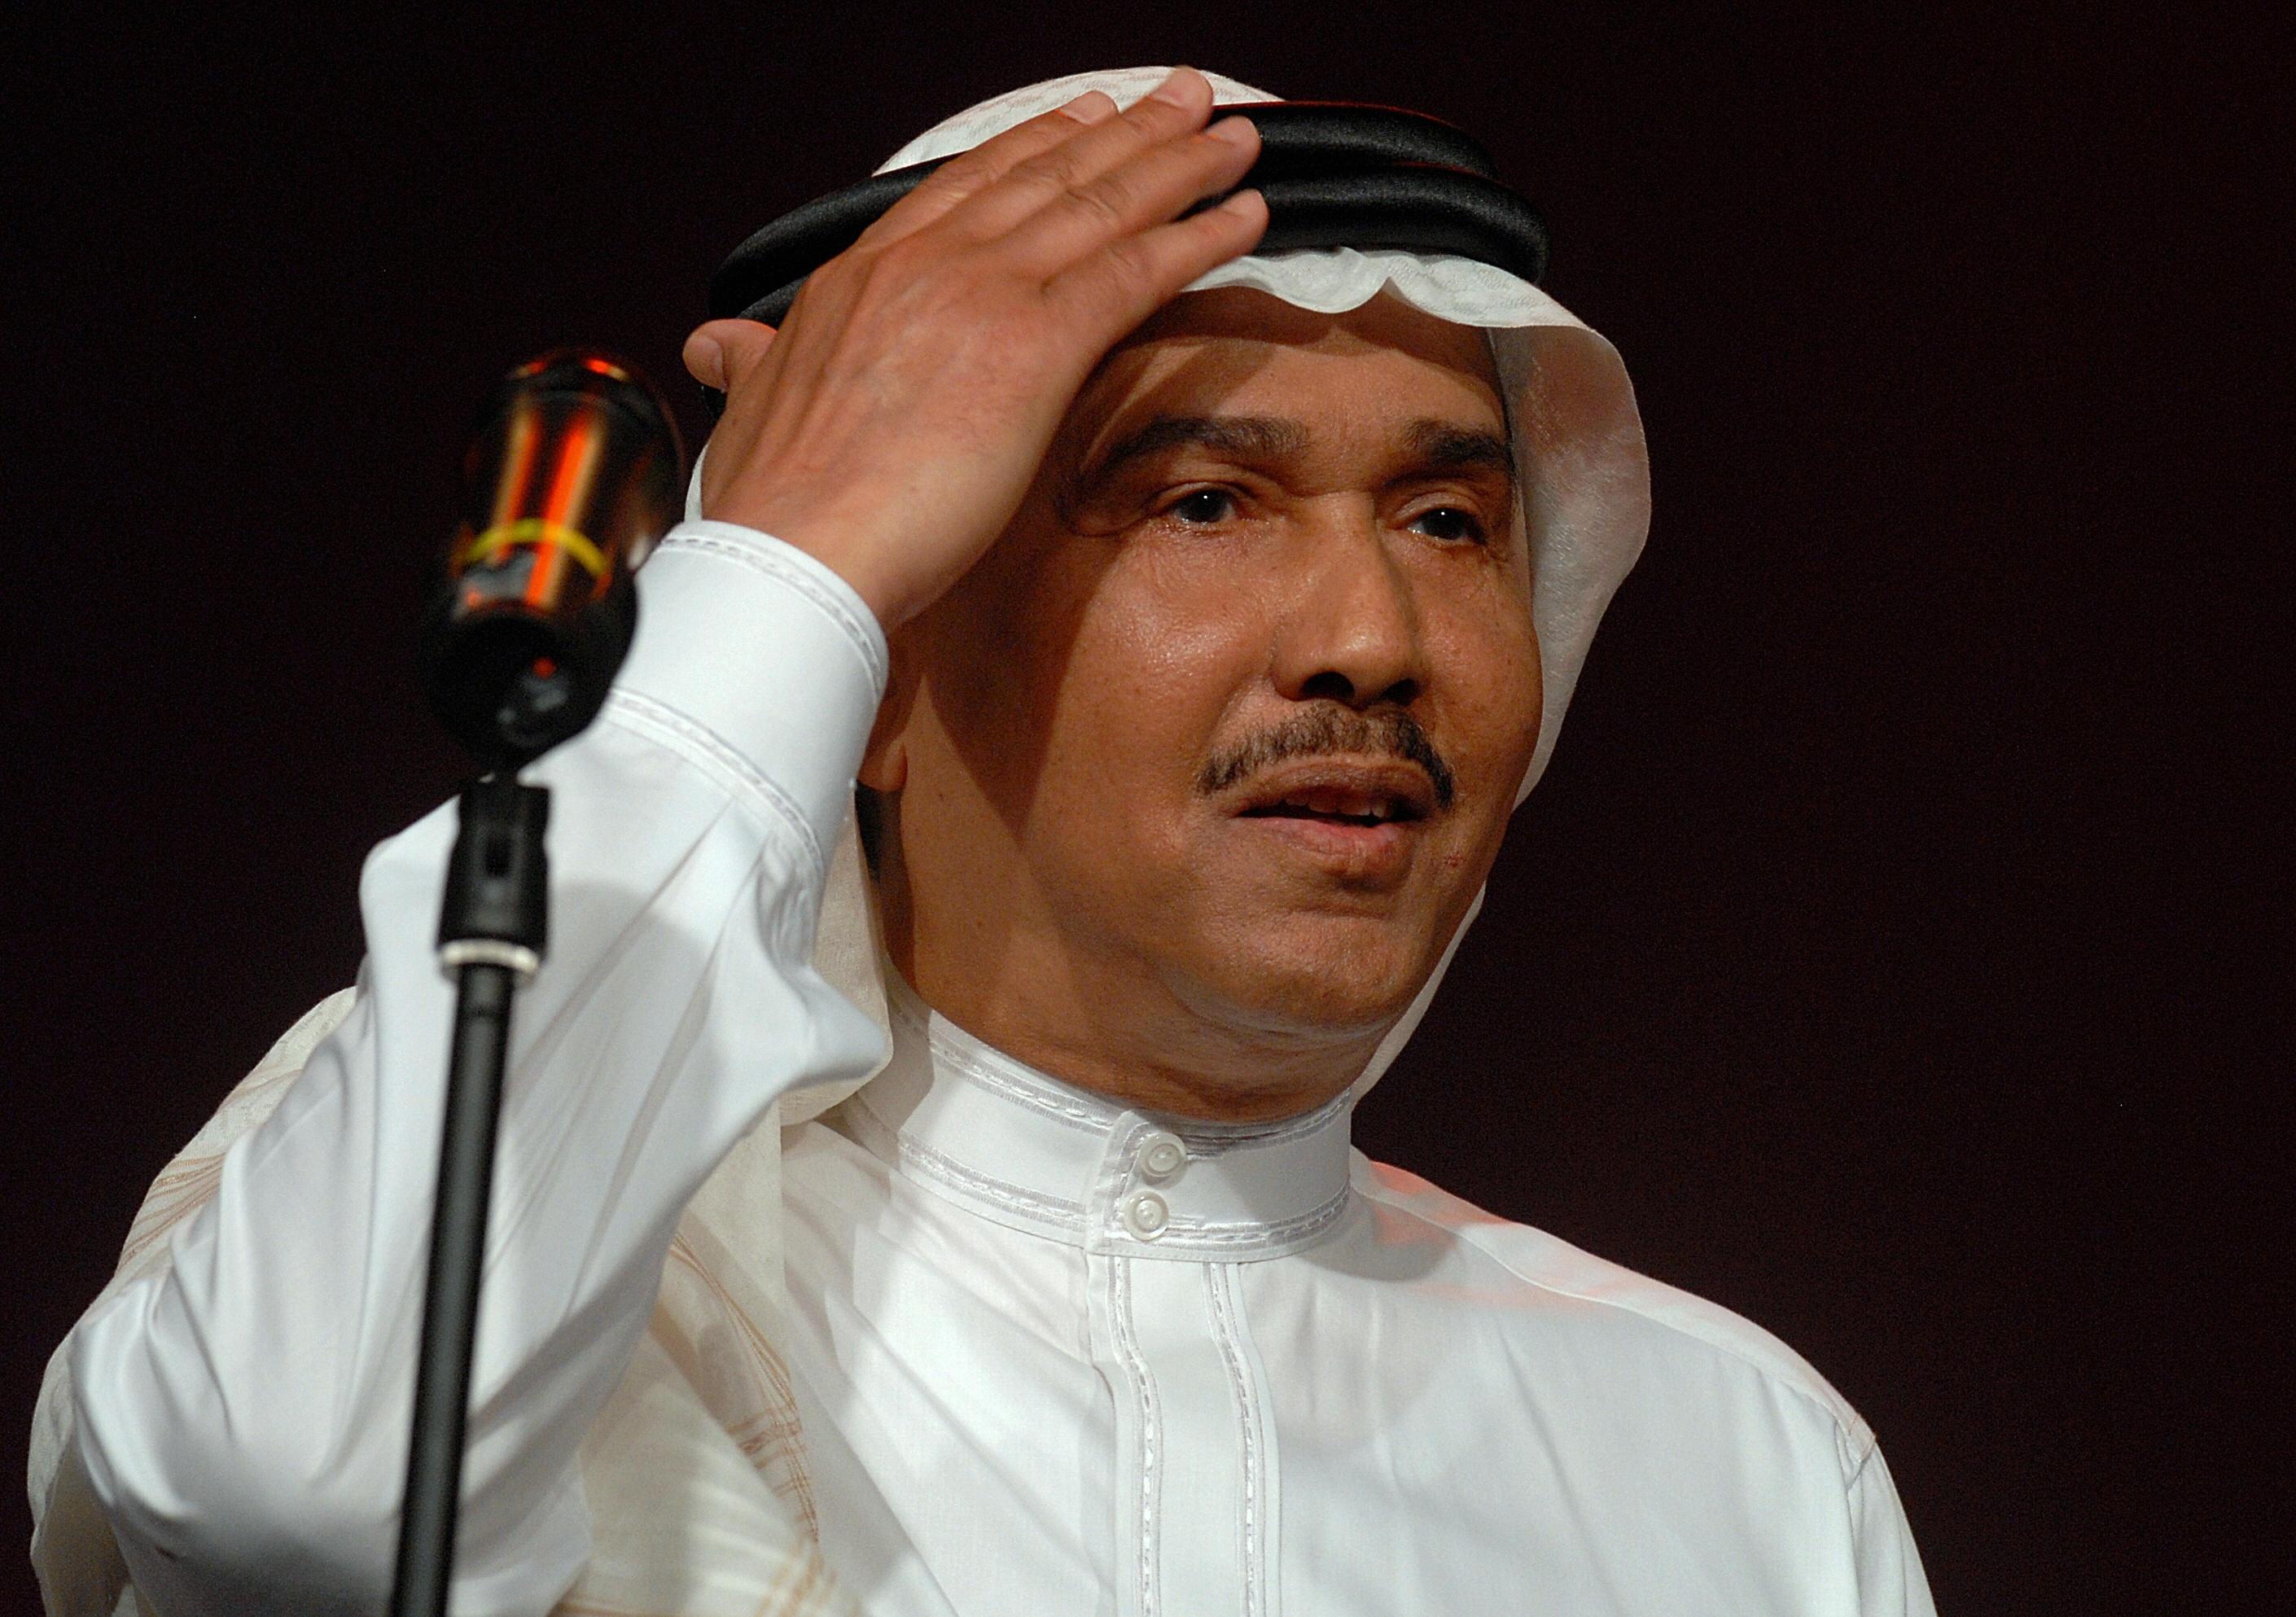 e37952fe7 جمهور الأردن والكويت في حيرة مع «أجمل ما غنى محمد عبده» – قناة الغد